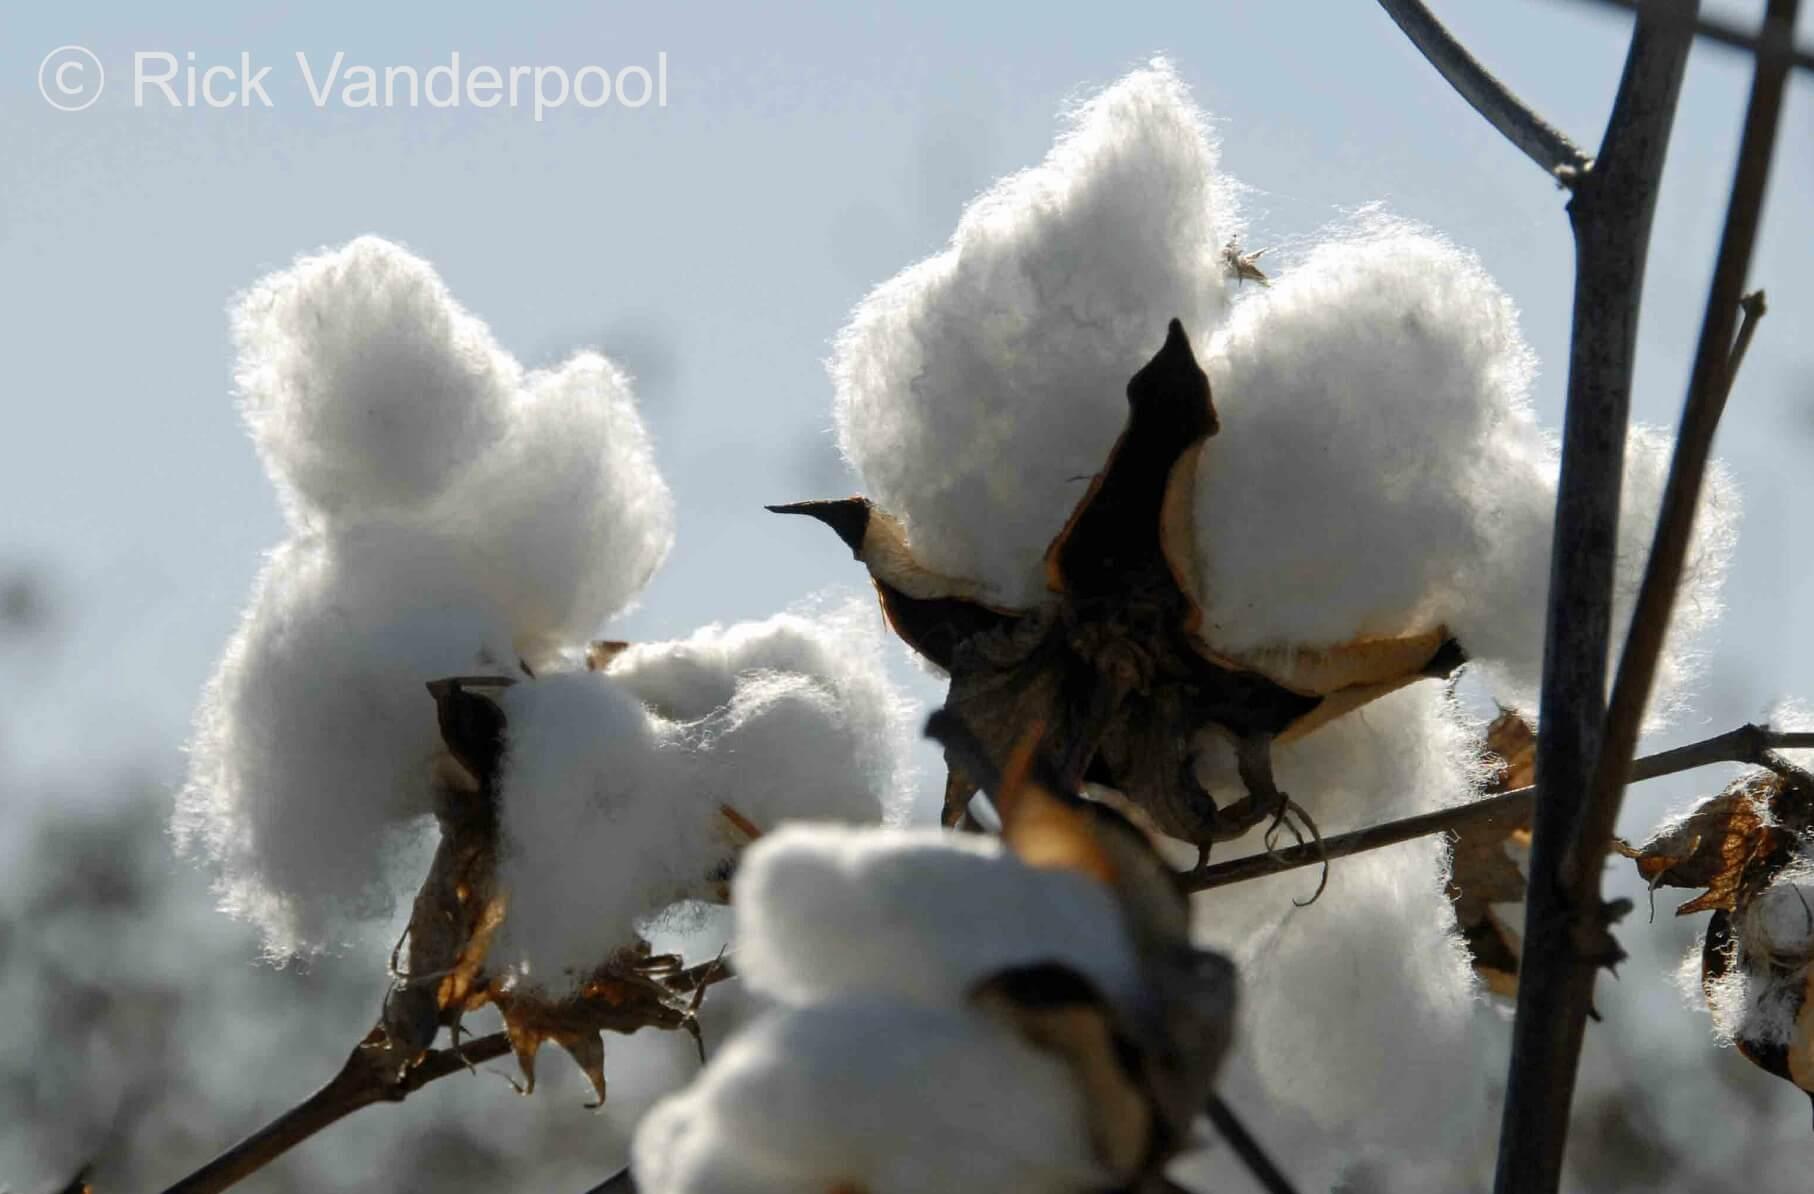 Fluffy cotton bolls